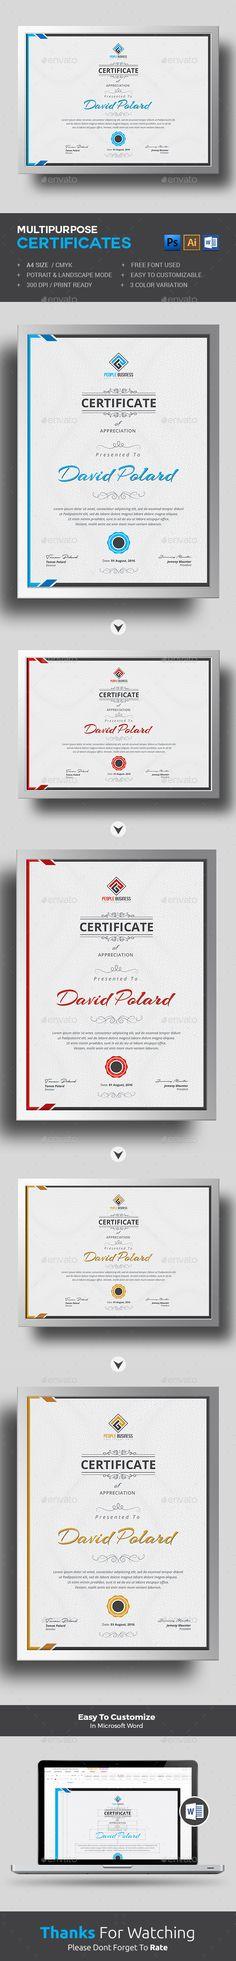 Great Appreciation Certificates Templates Free - degree certificate template